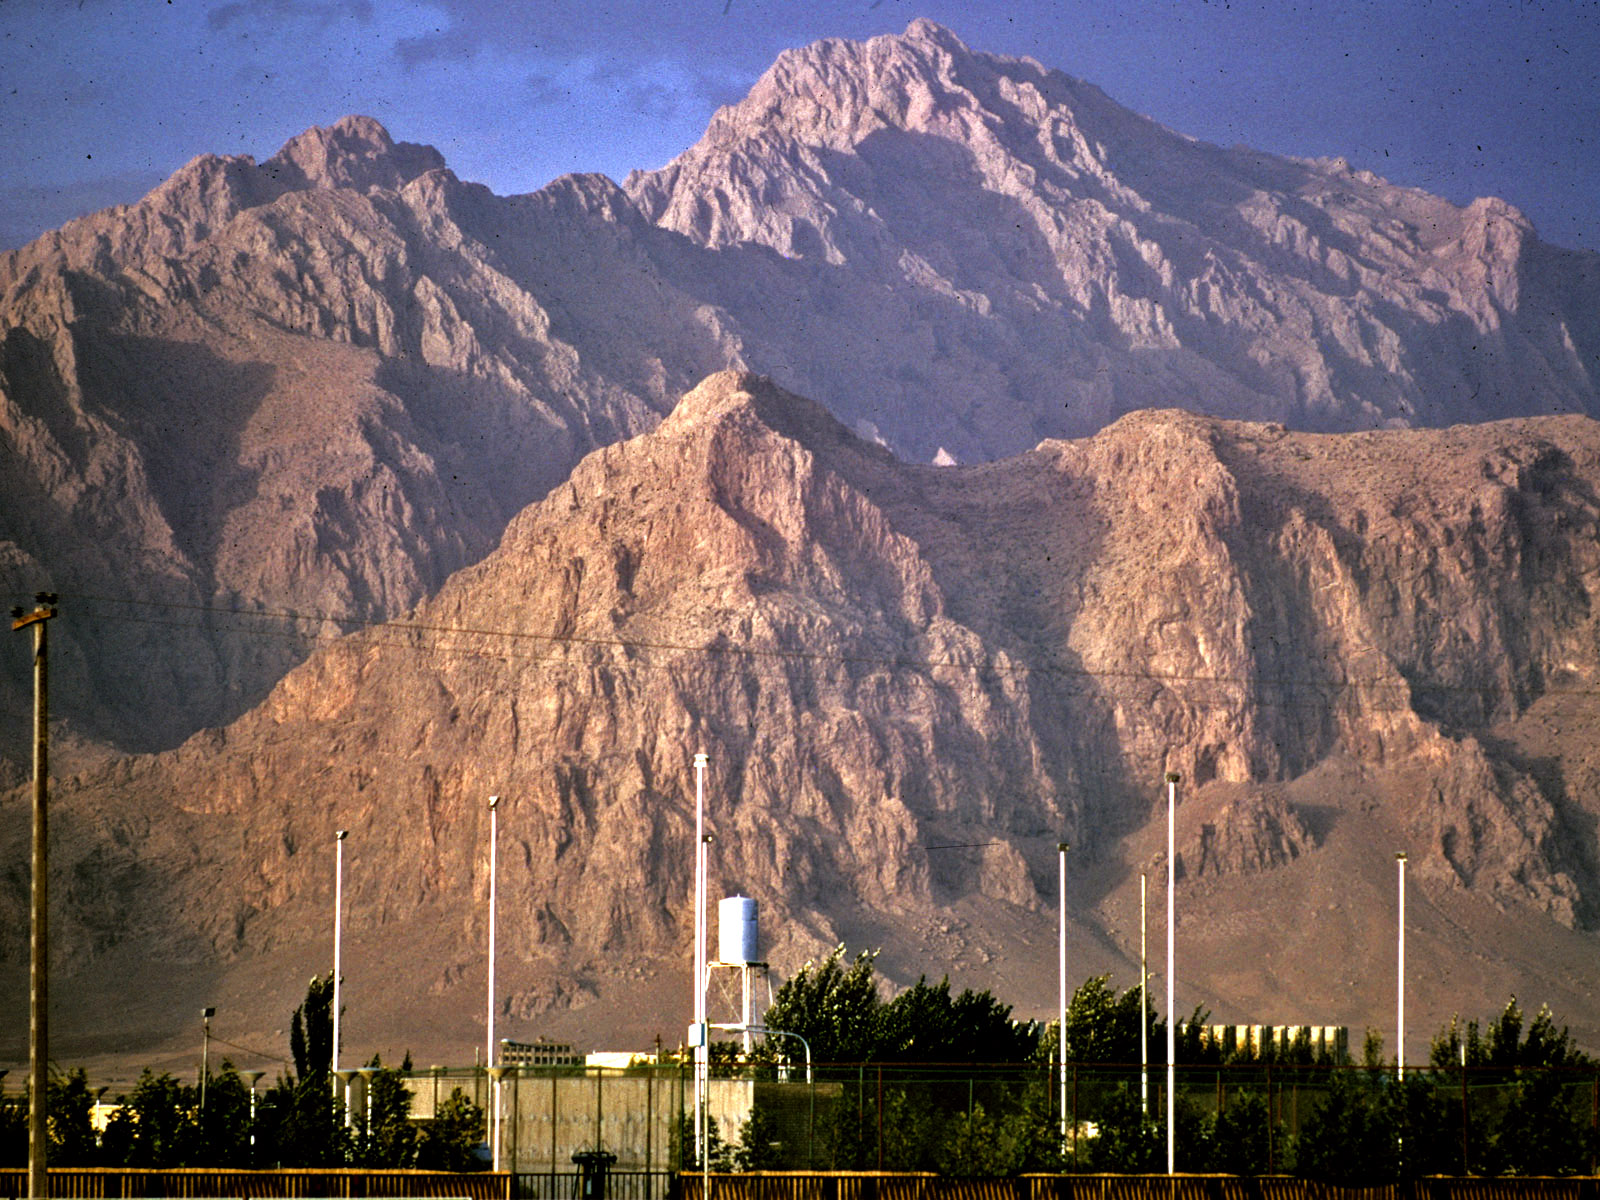 Kuh-i-Parau seen from Kermanshah (Tony Waltham)